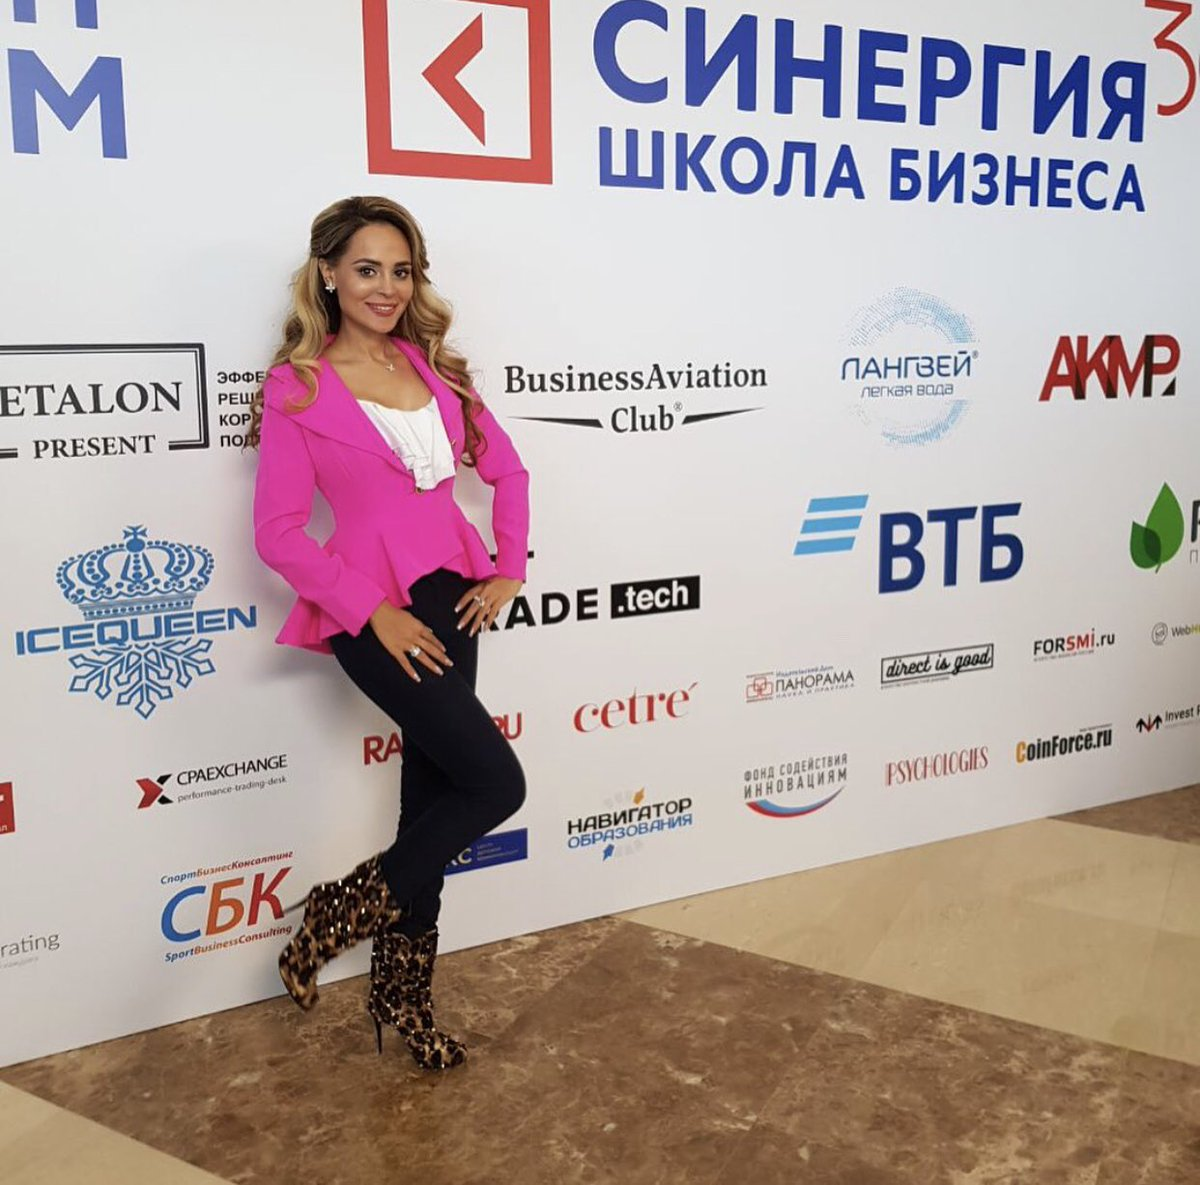 Anna Kalashnikova  - SYNERGY INSI twitter @anna_kalash synergy,synergyinsight,forum